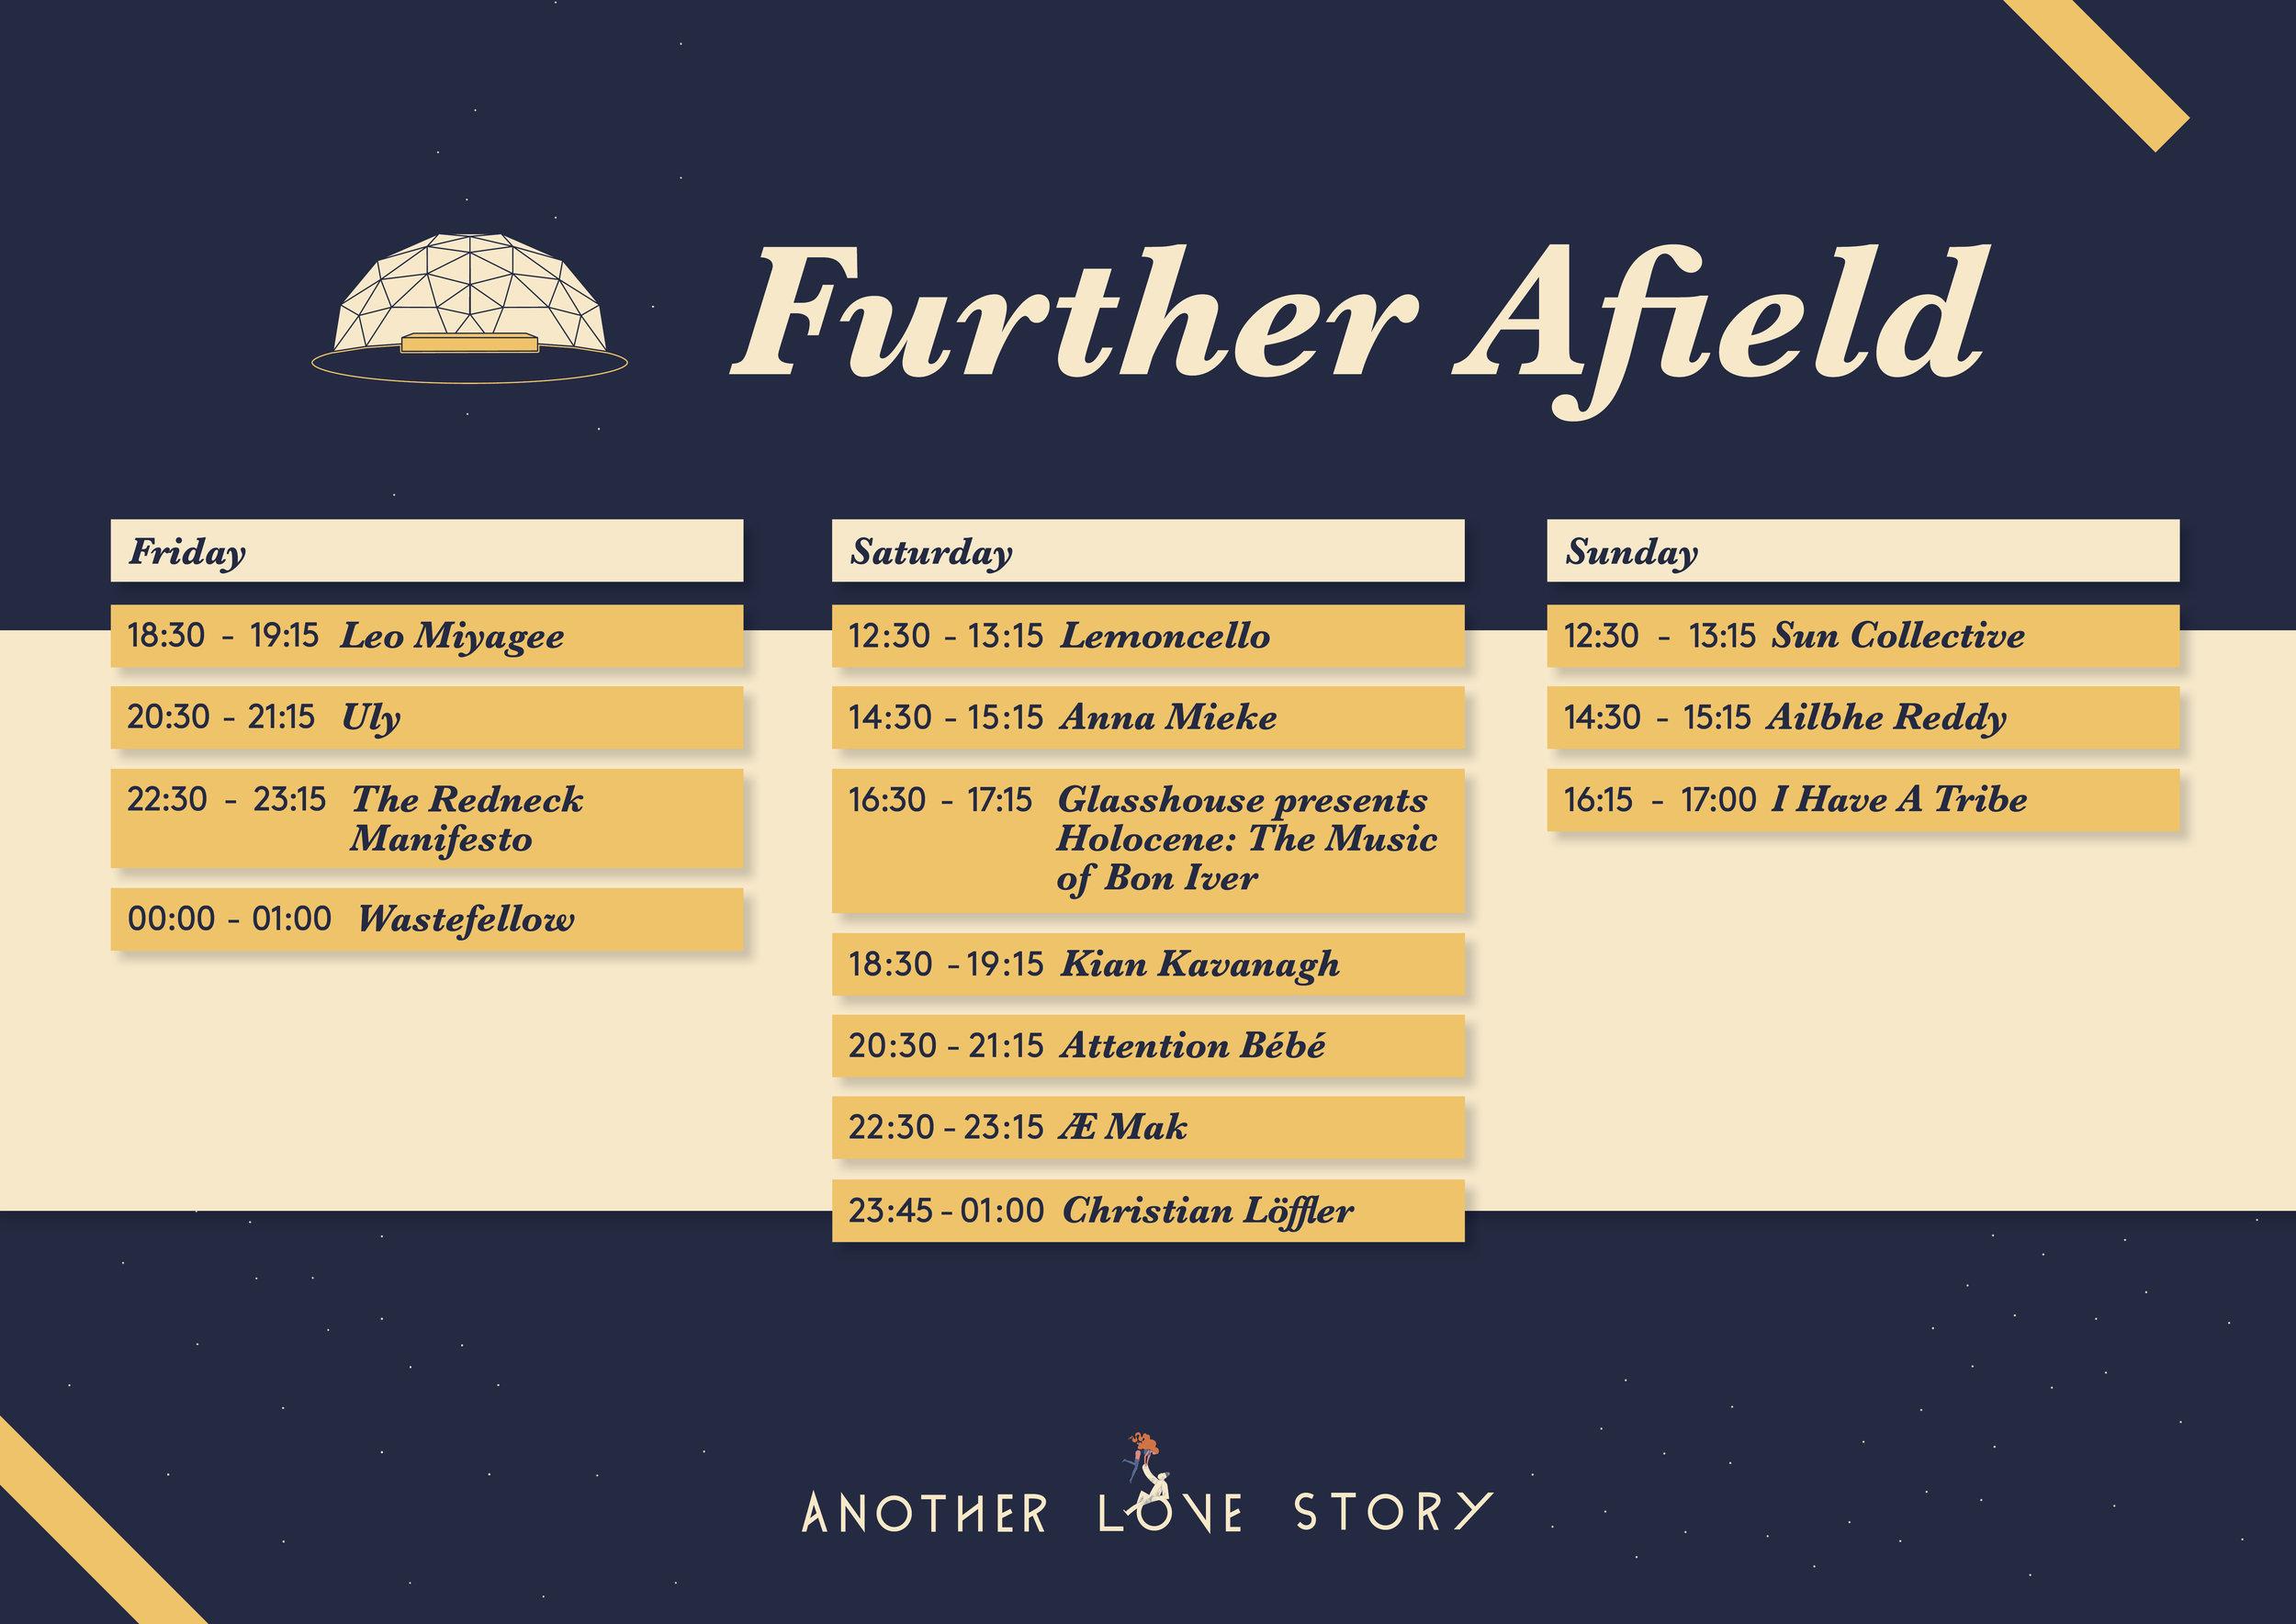 schedules_further afield.jpg